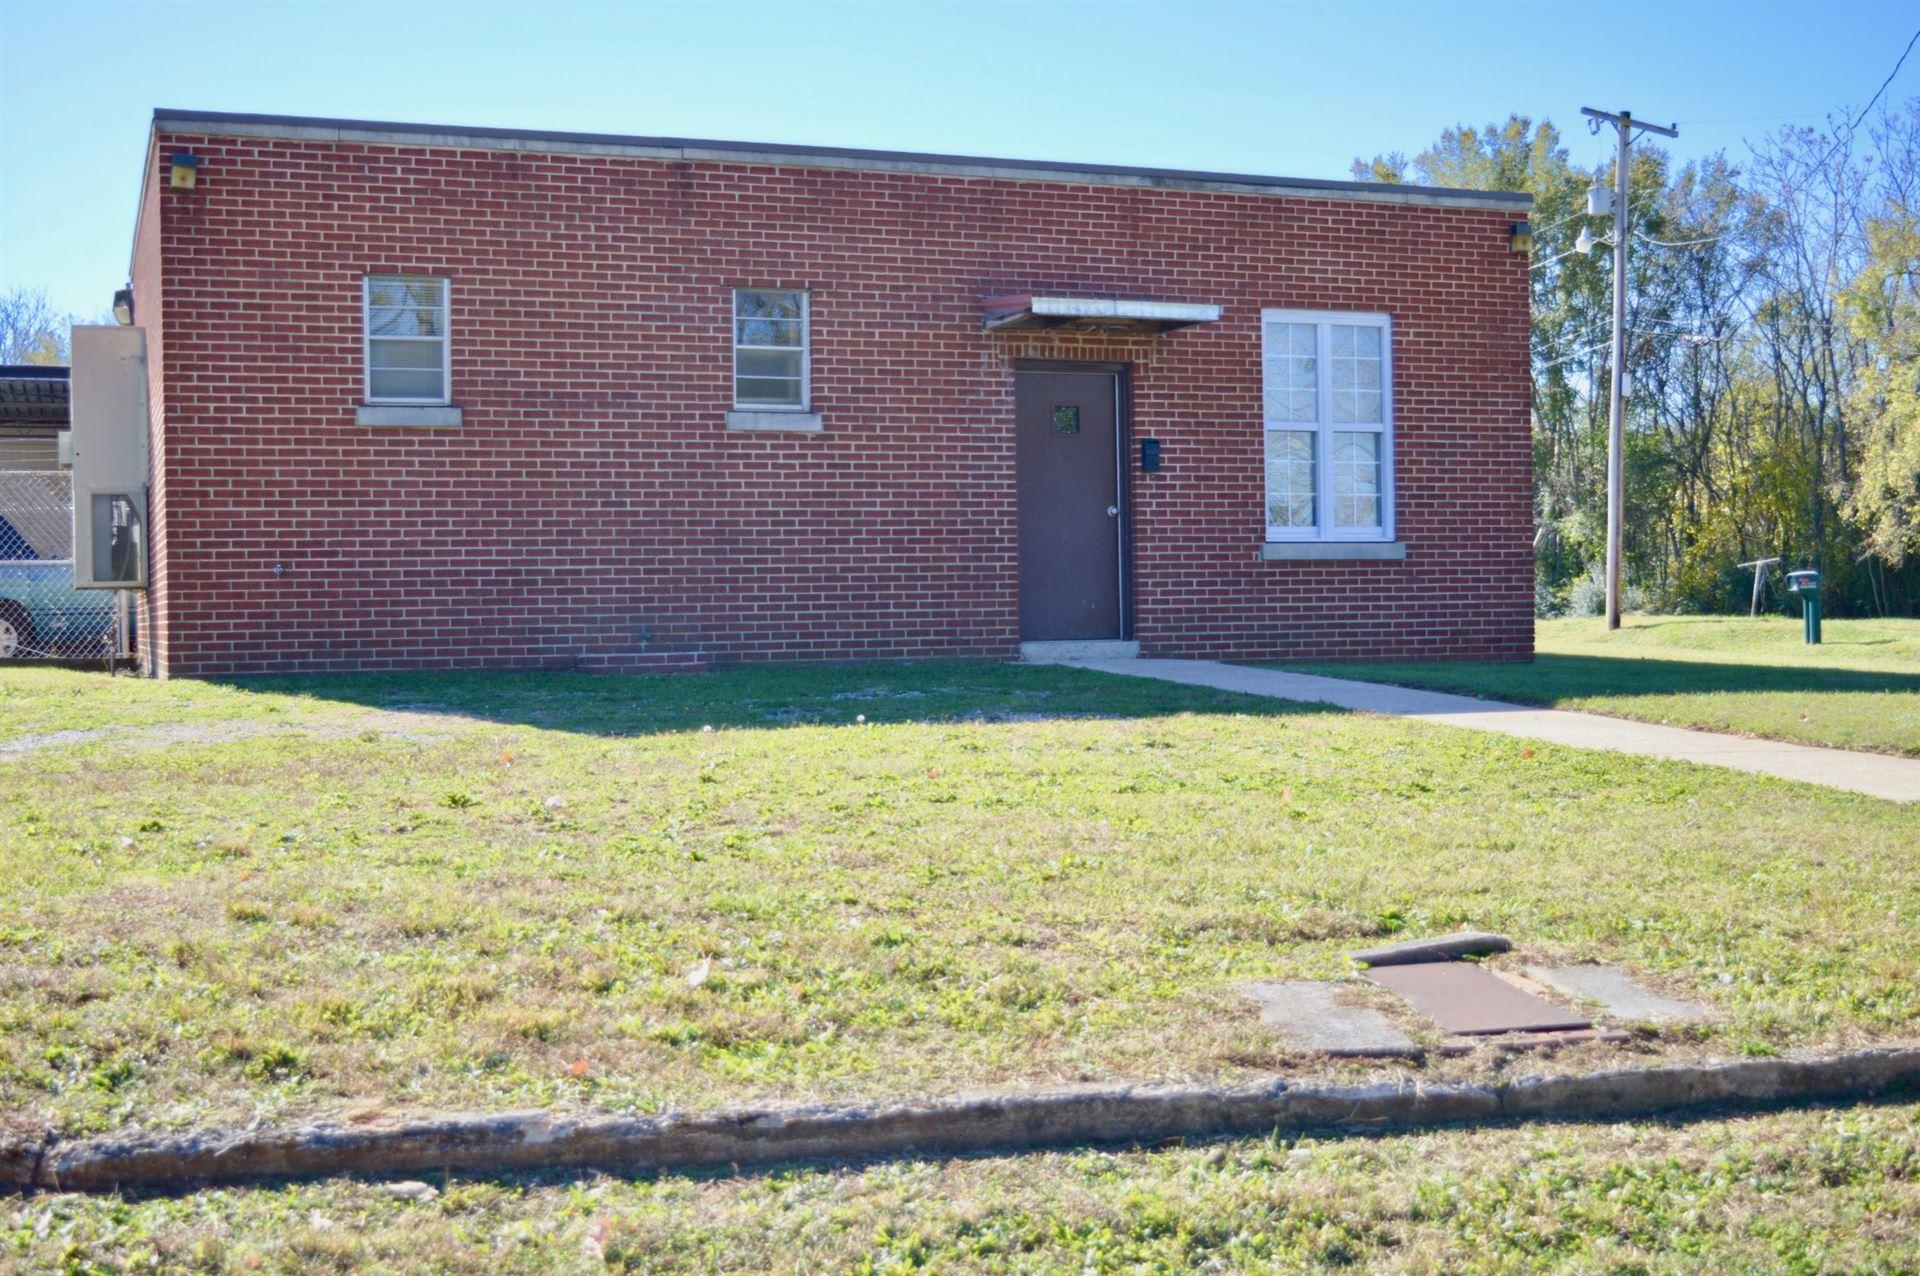 1000 Old Cowan Rd, Winchester, TN 37398 - MLS#: 2207771